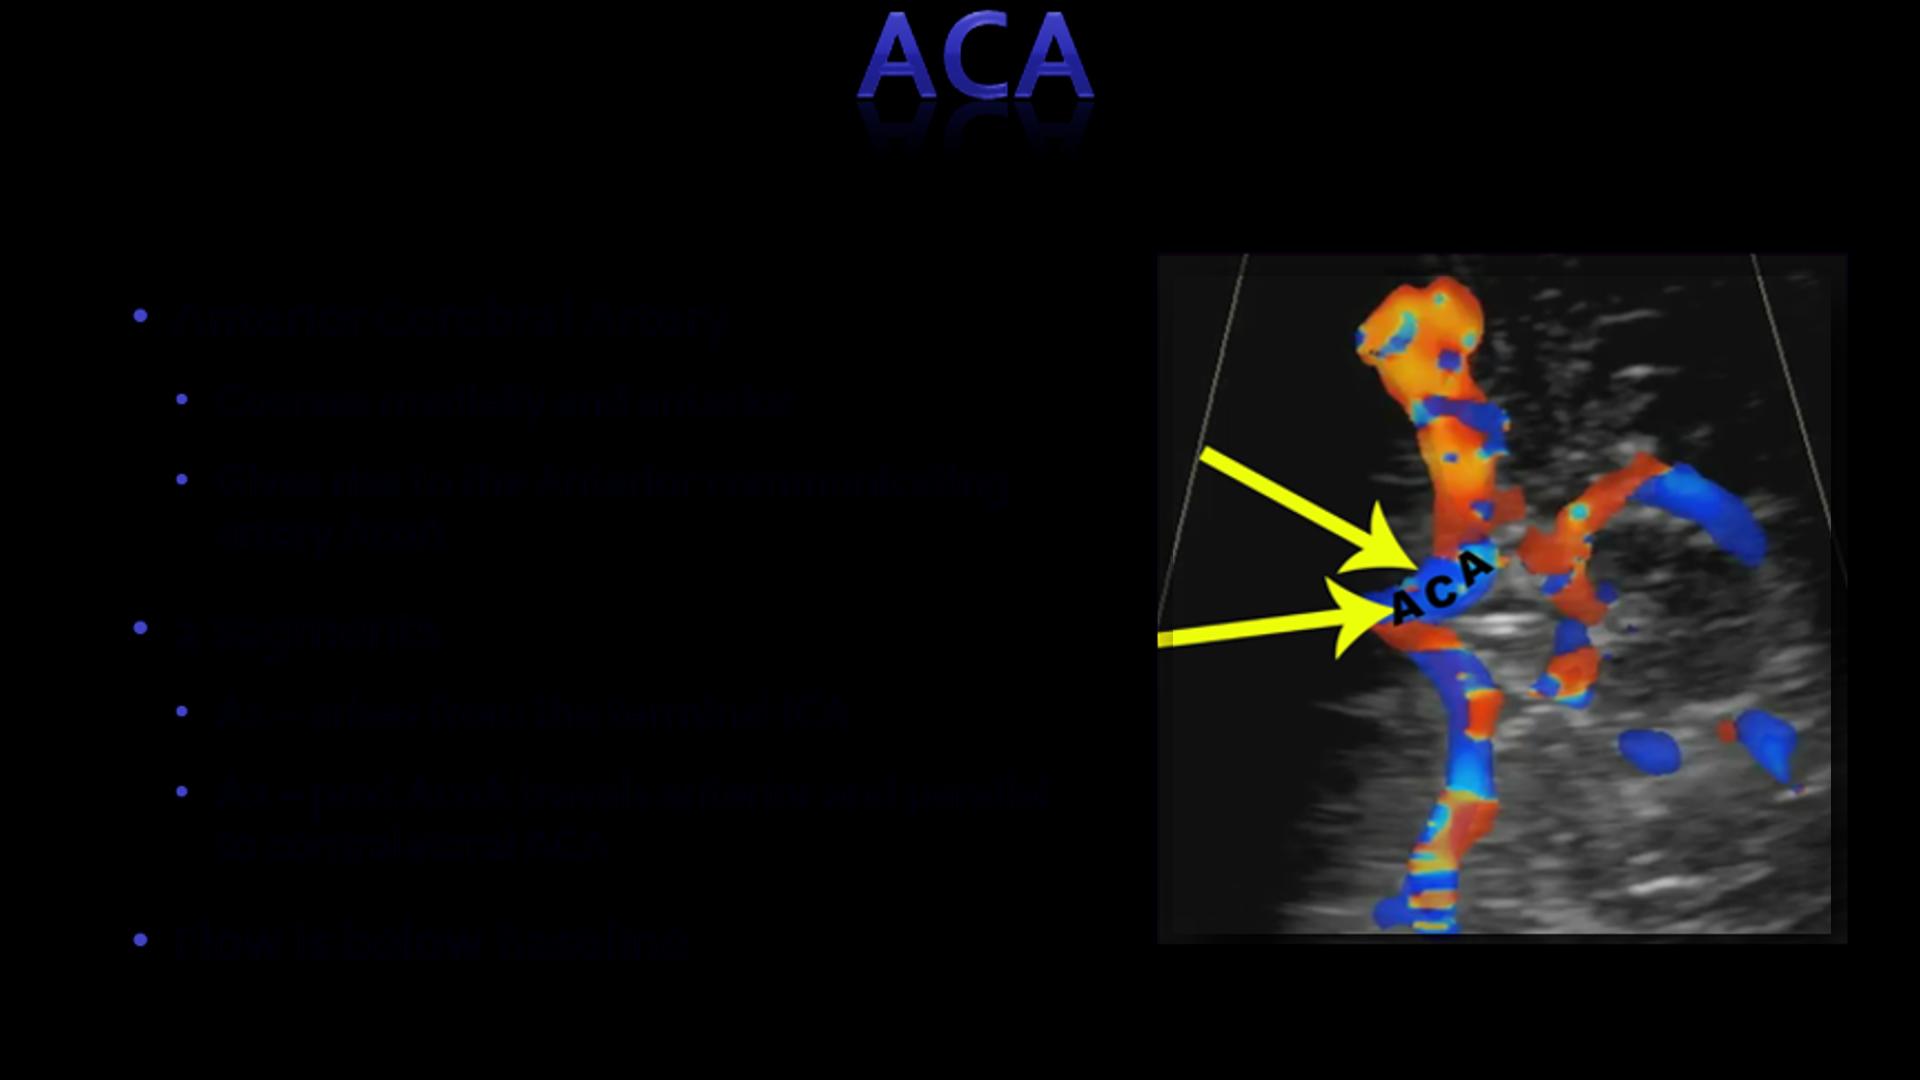 Transcranial Doppler Sonographic Tendencies In